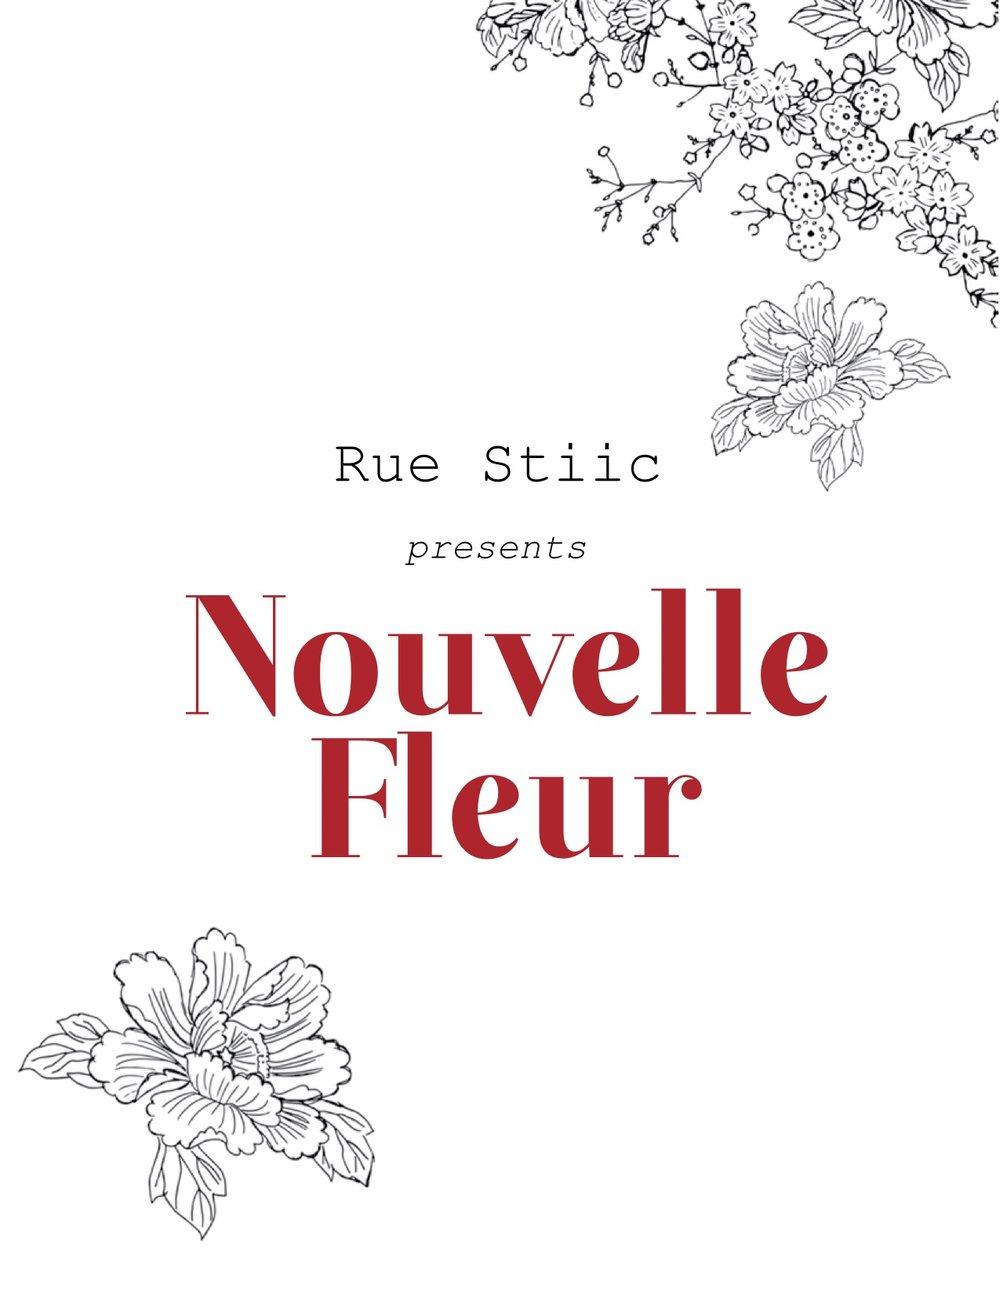 Nouvelle Fleur Linesheet P1.jpg